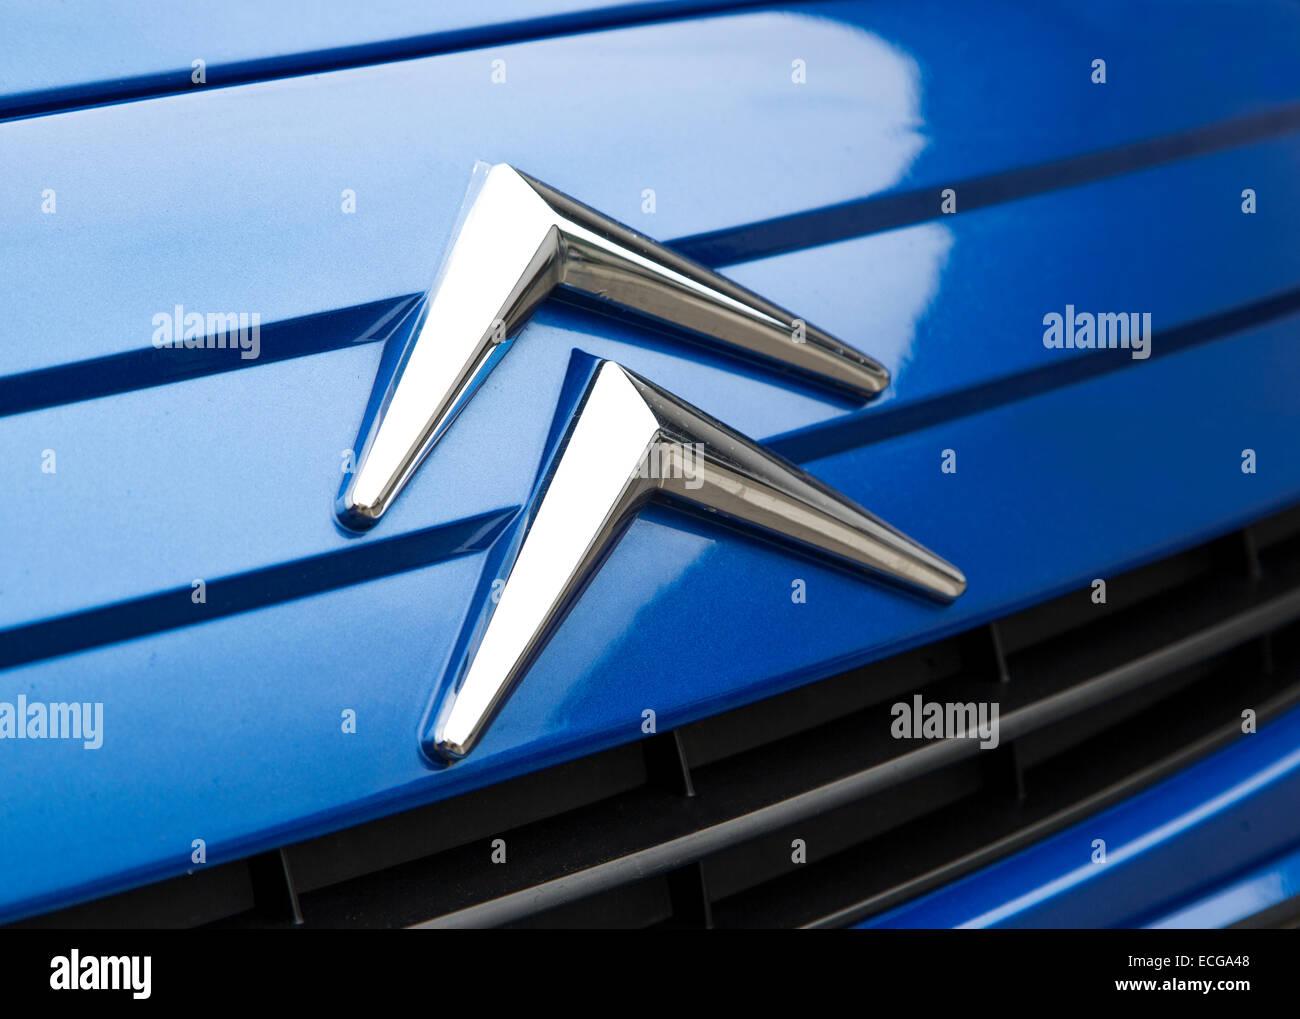 Detail of the Citroen car in Belgrade, Serbia. - Stock Image